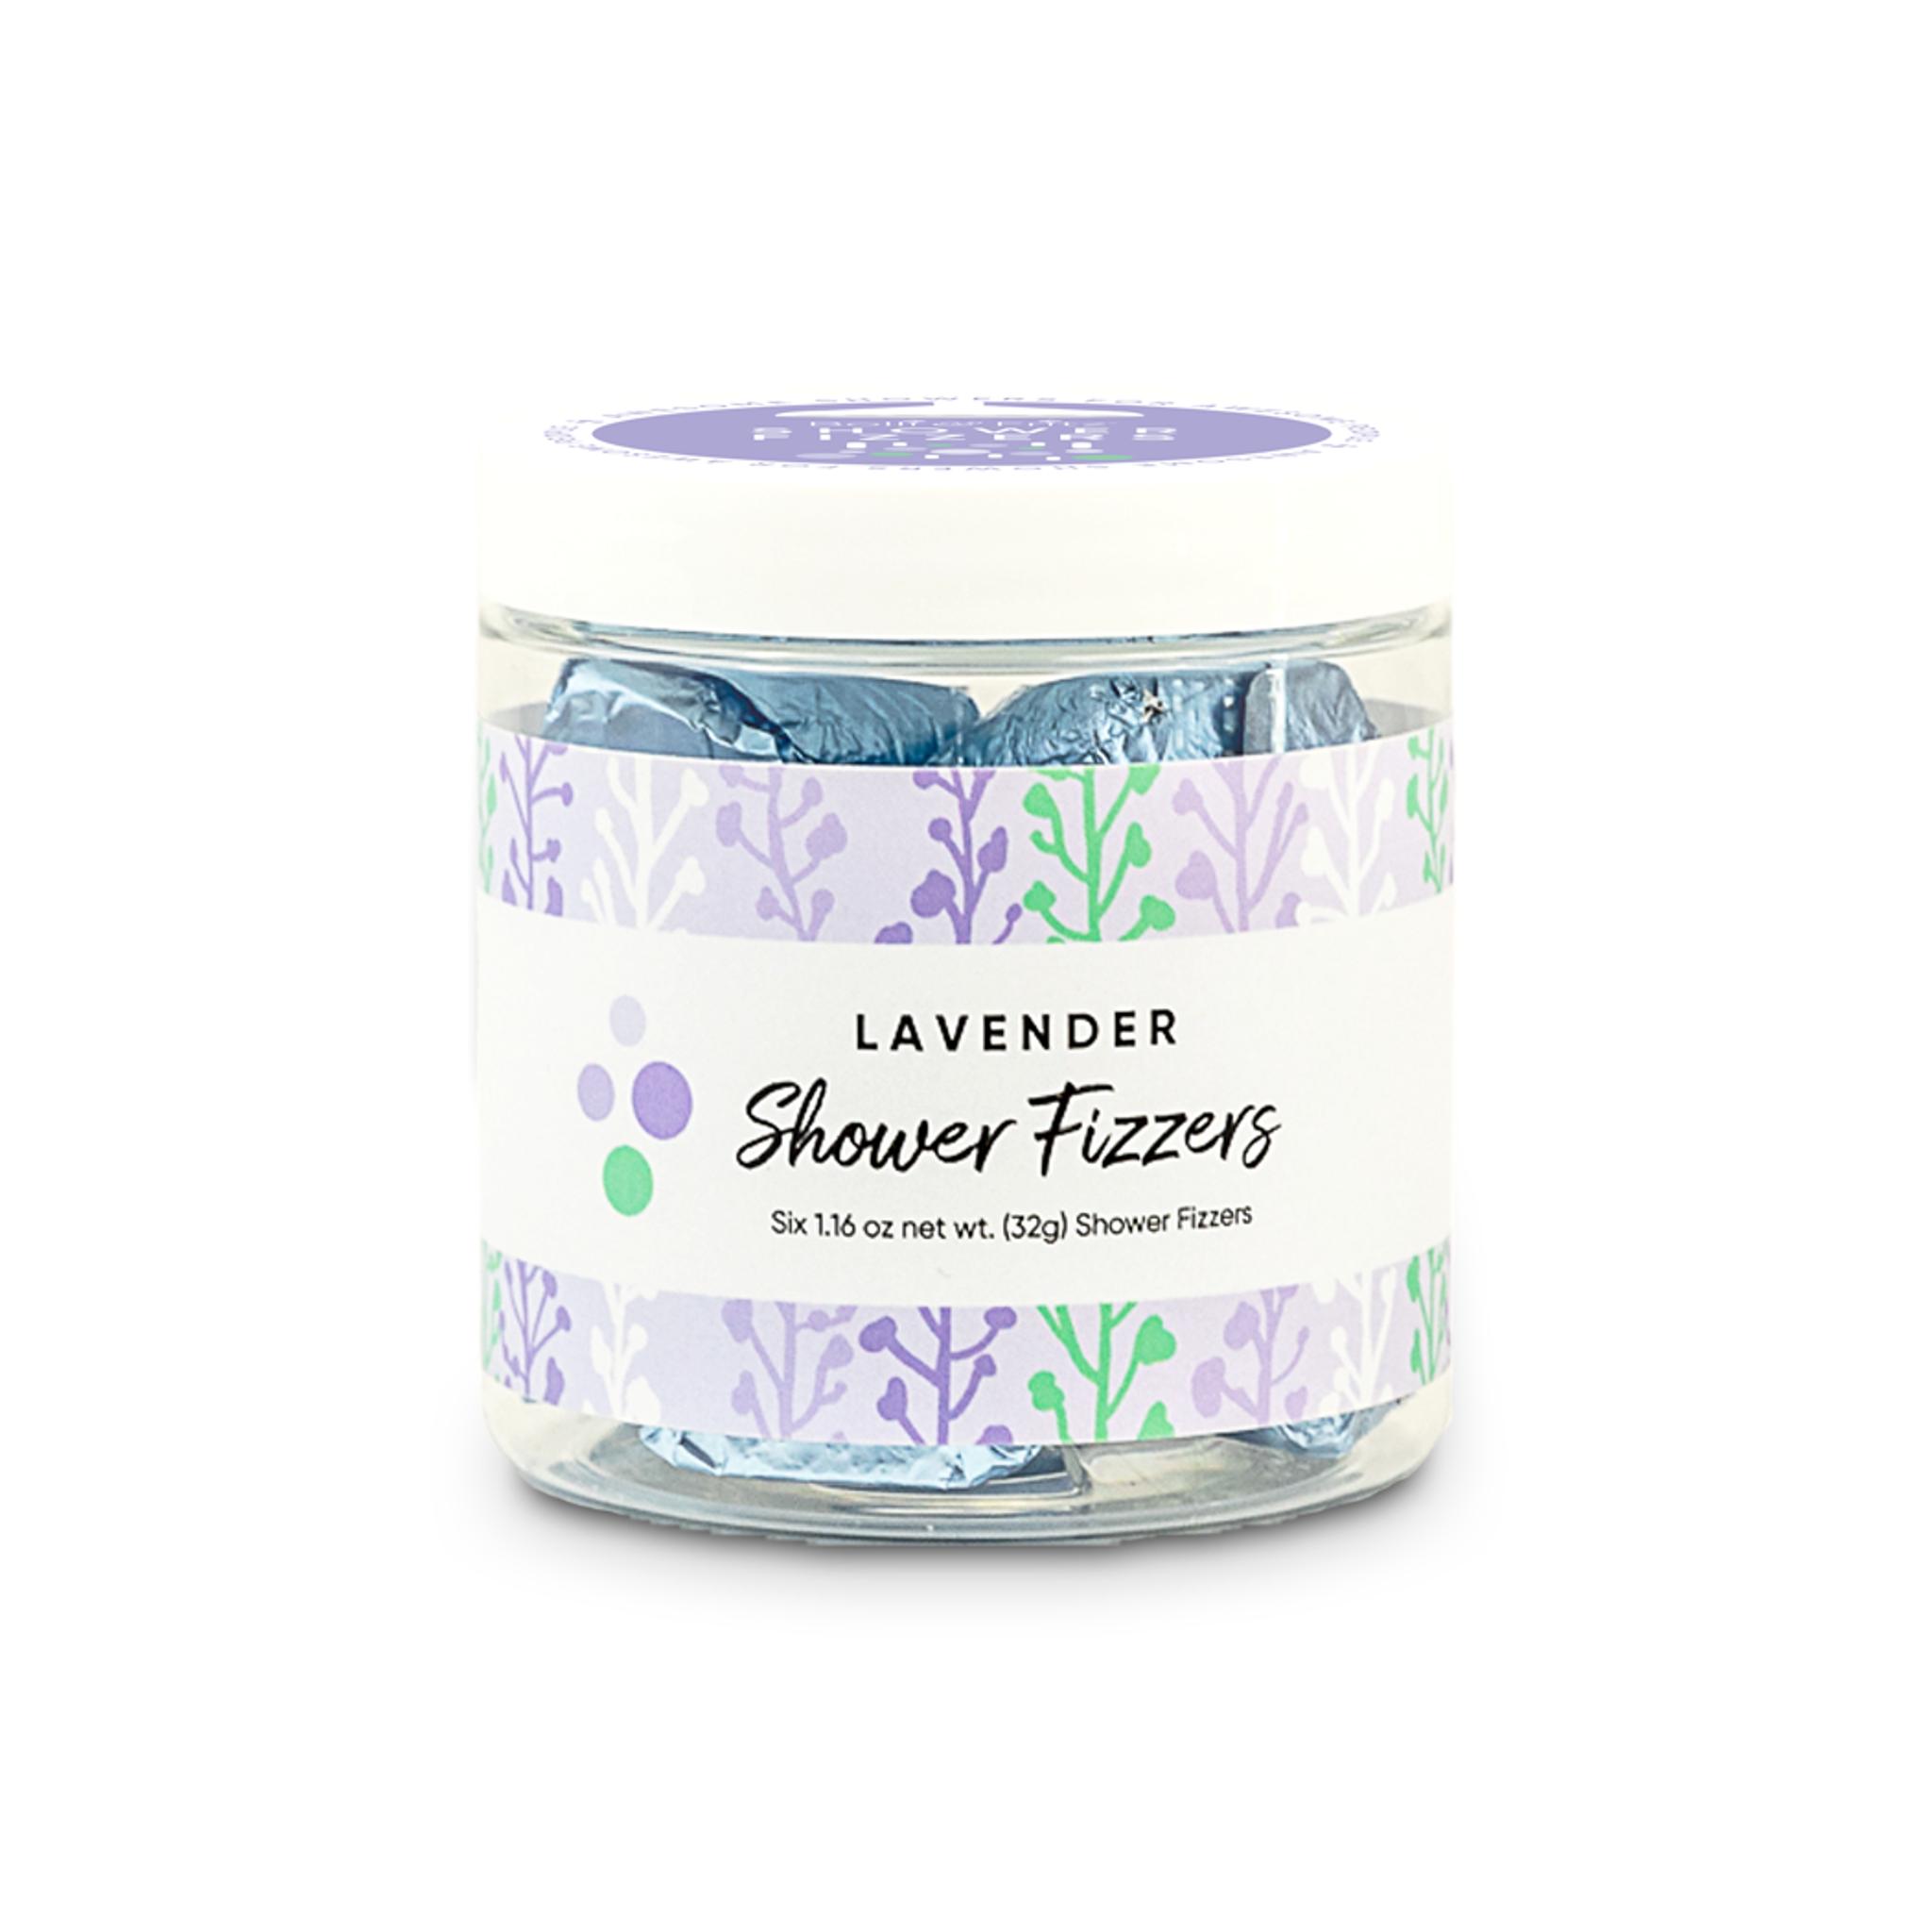 Shower Fizzer Tub - Lavender